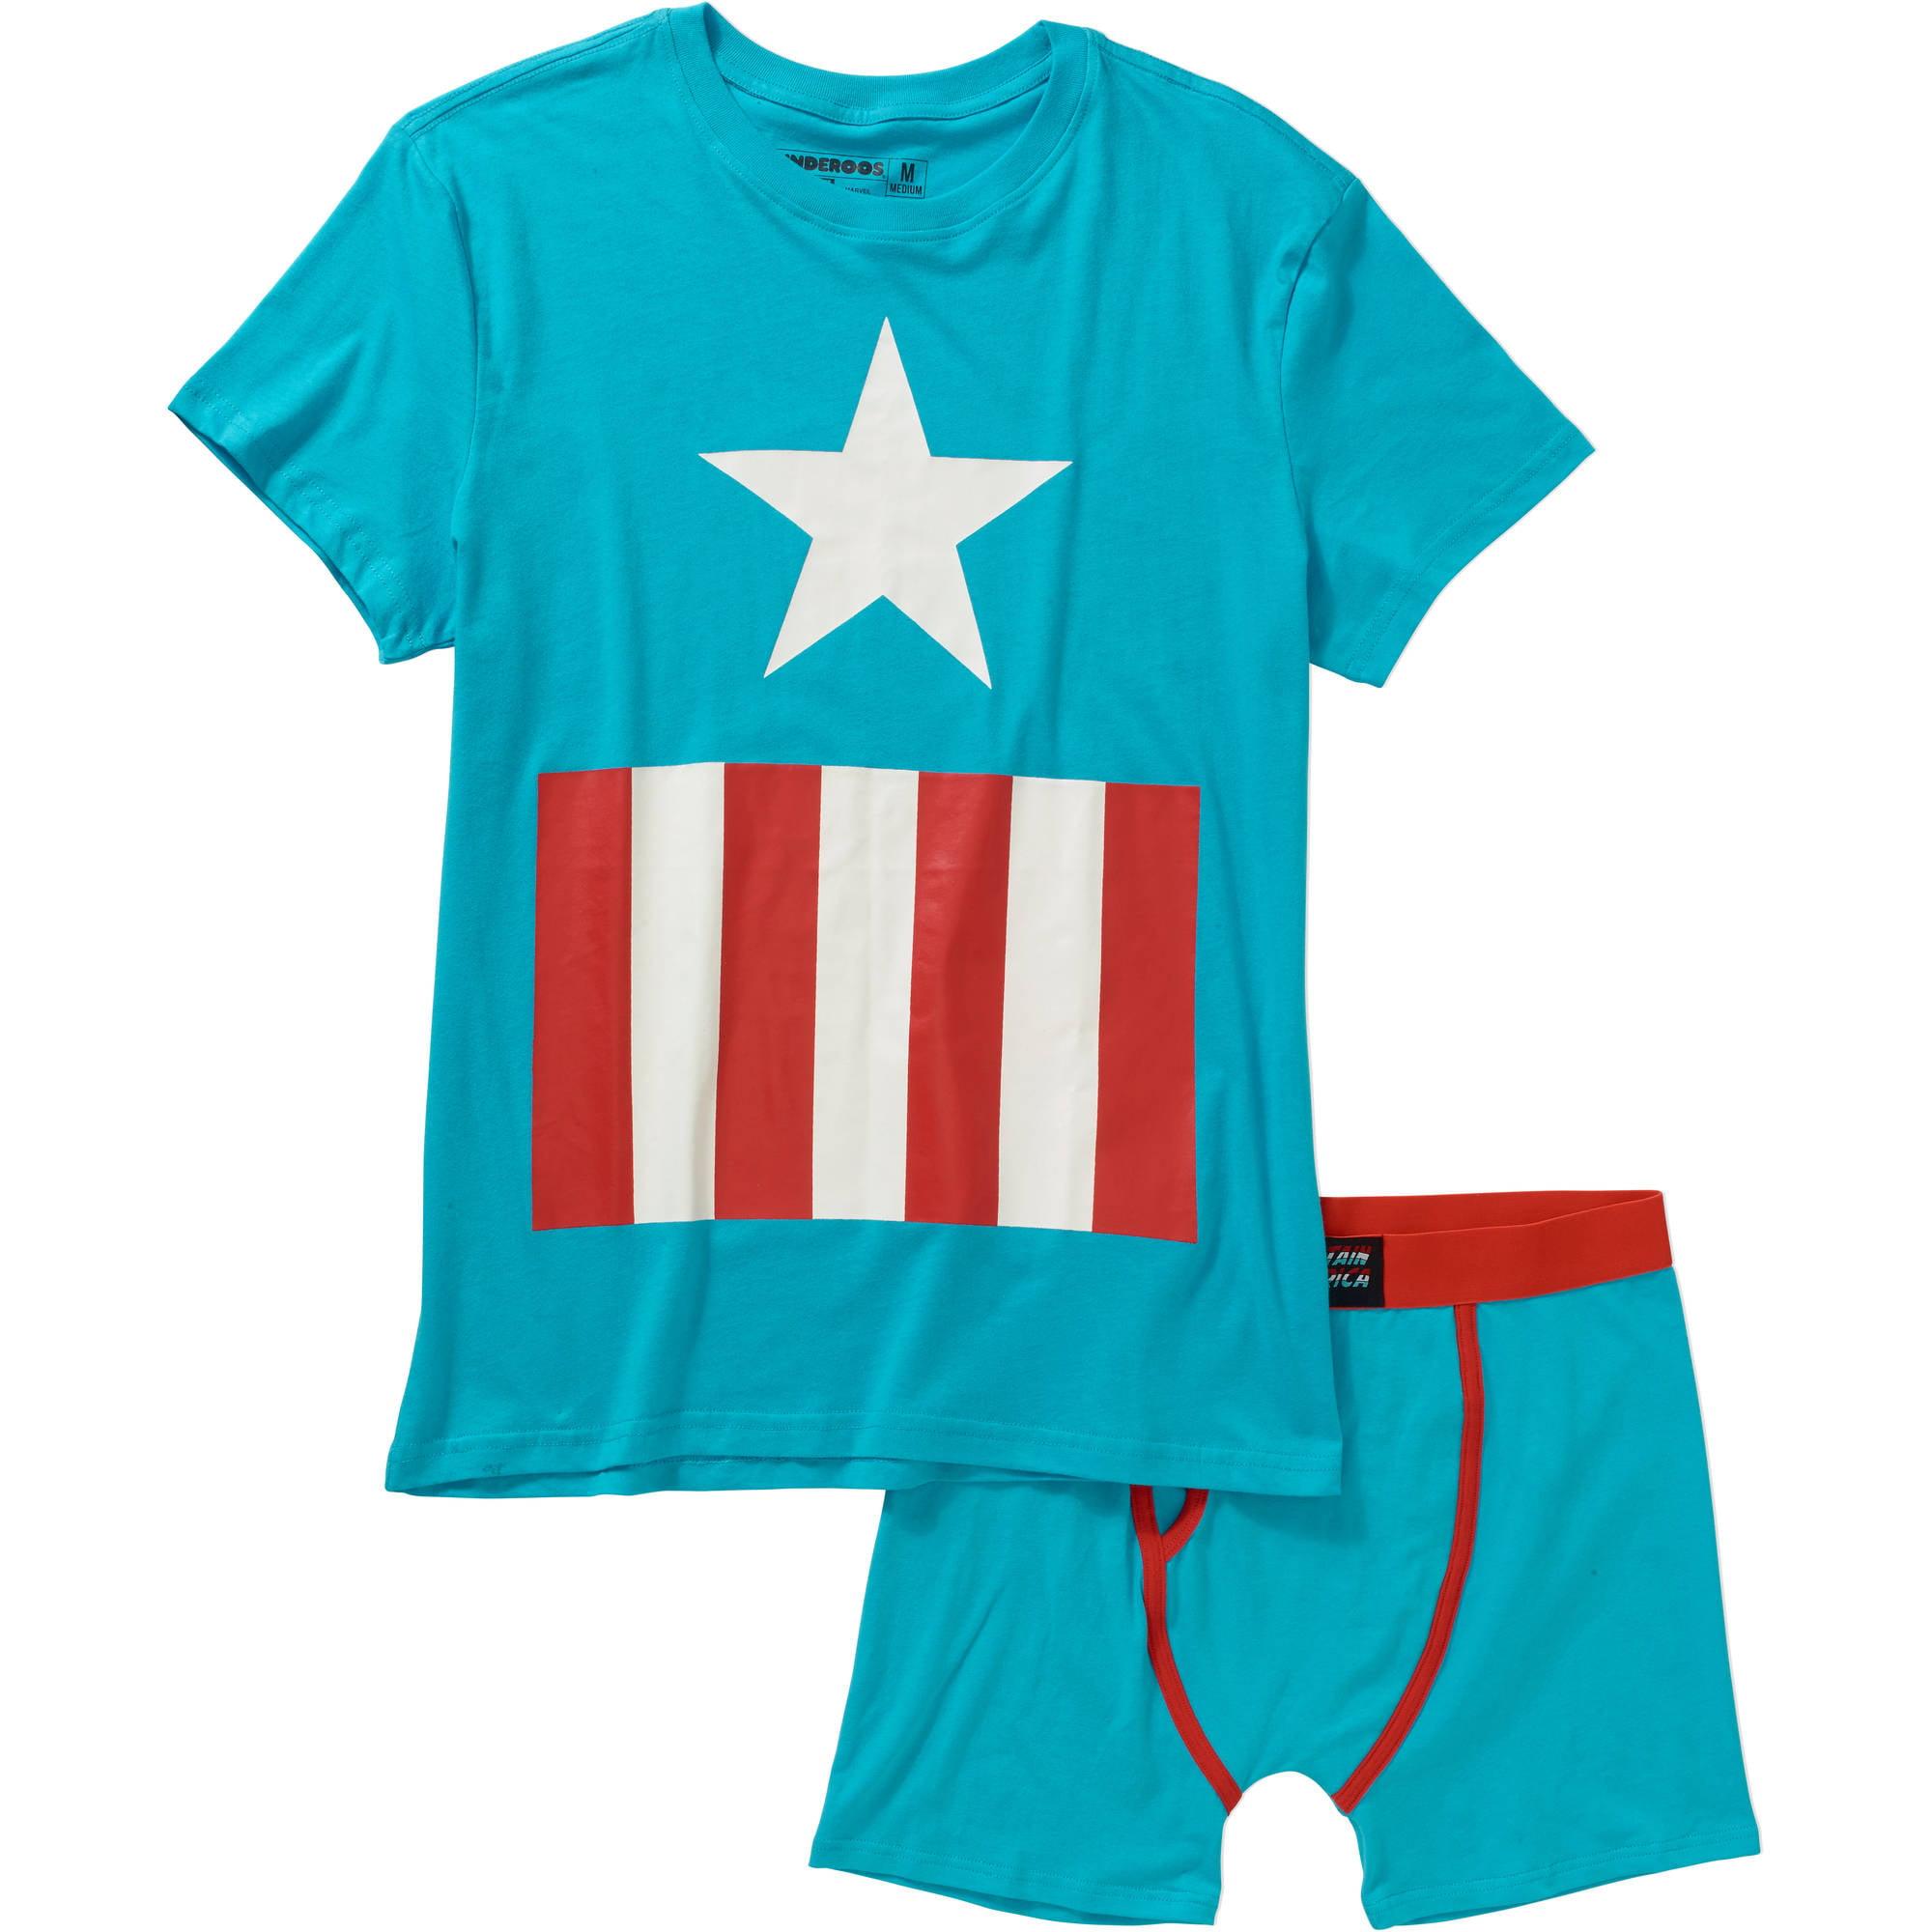 Captain America Men's Underoos Underwear Set